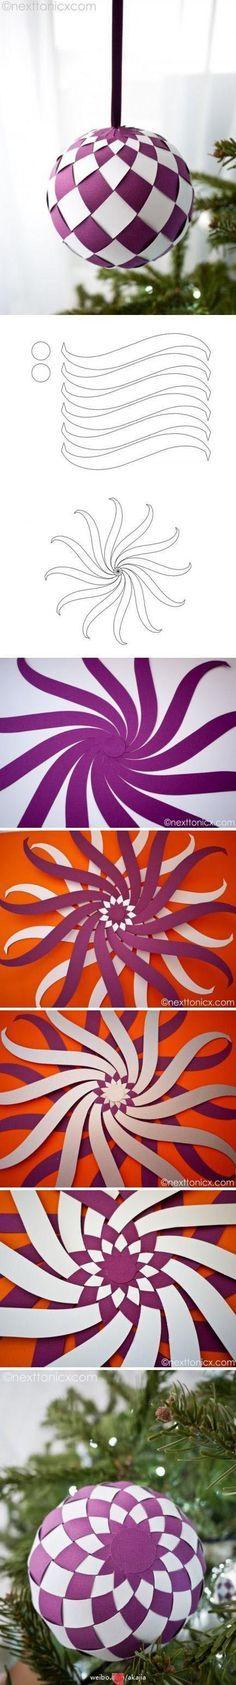 DIY ● Tutorial ● Woven paper baubles